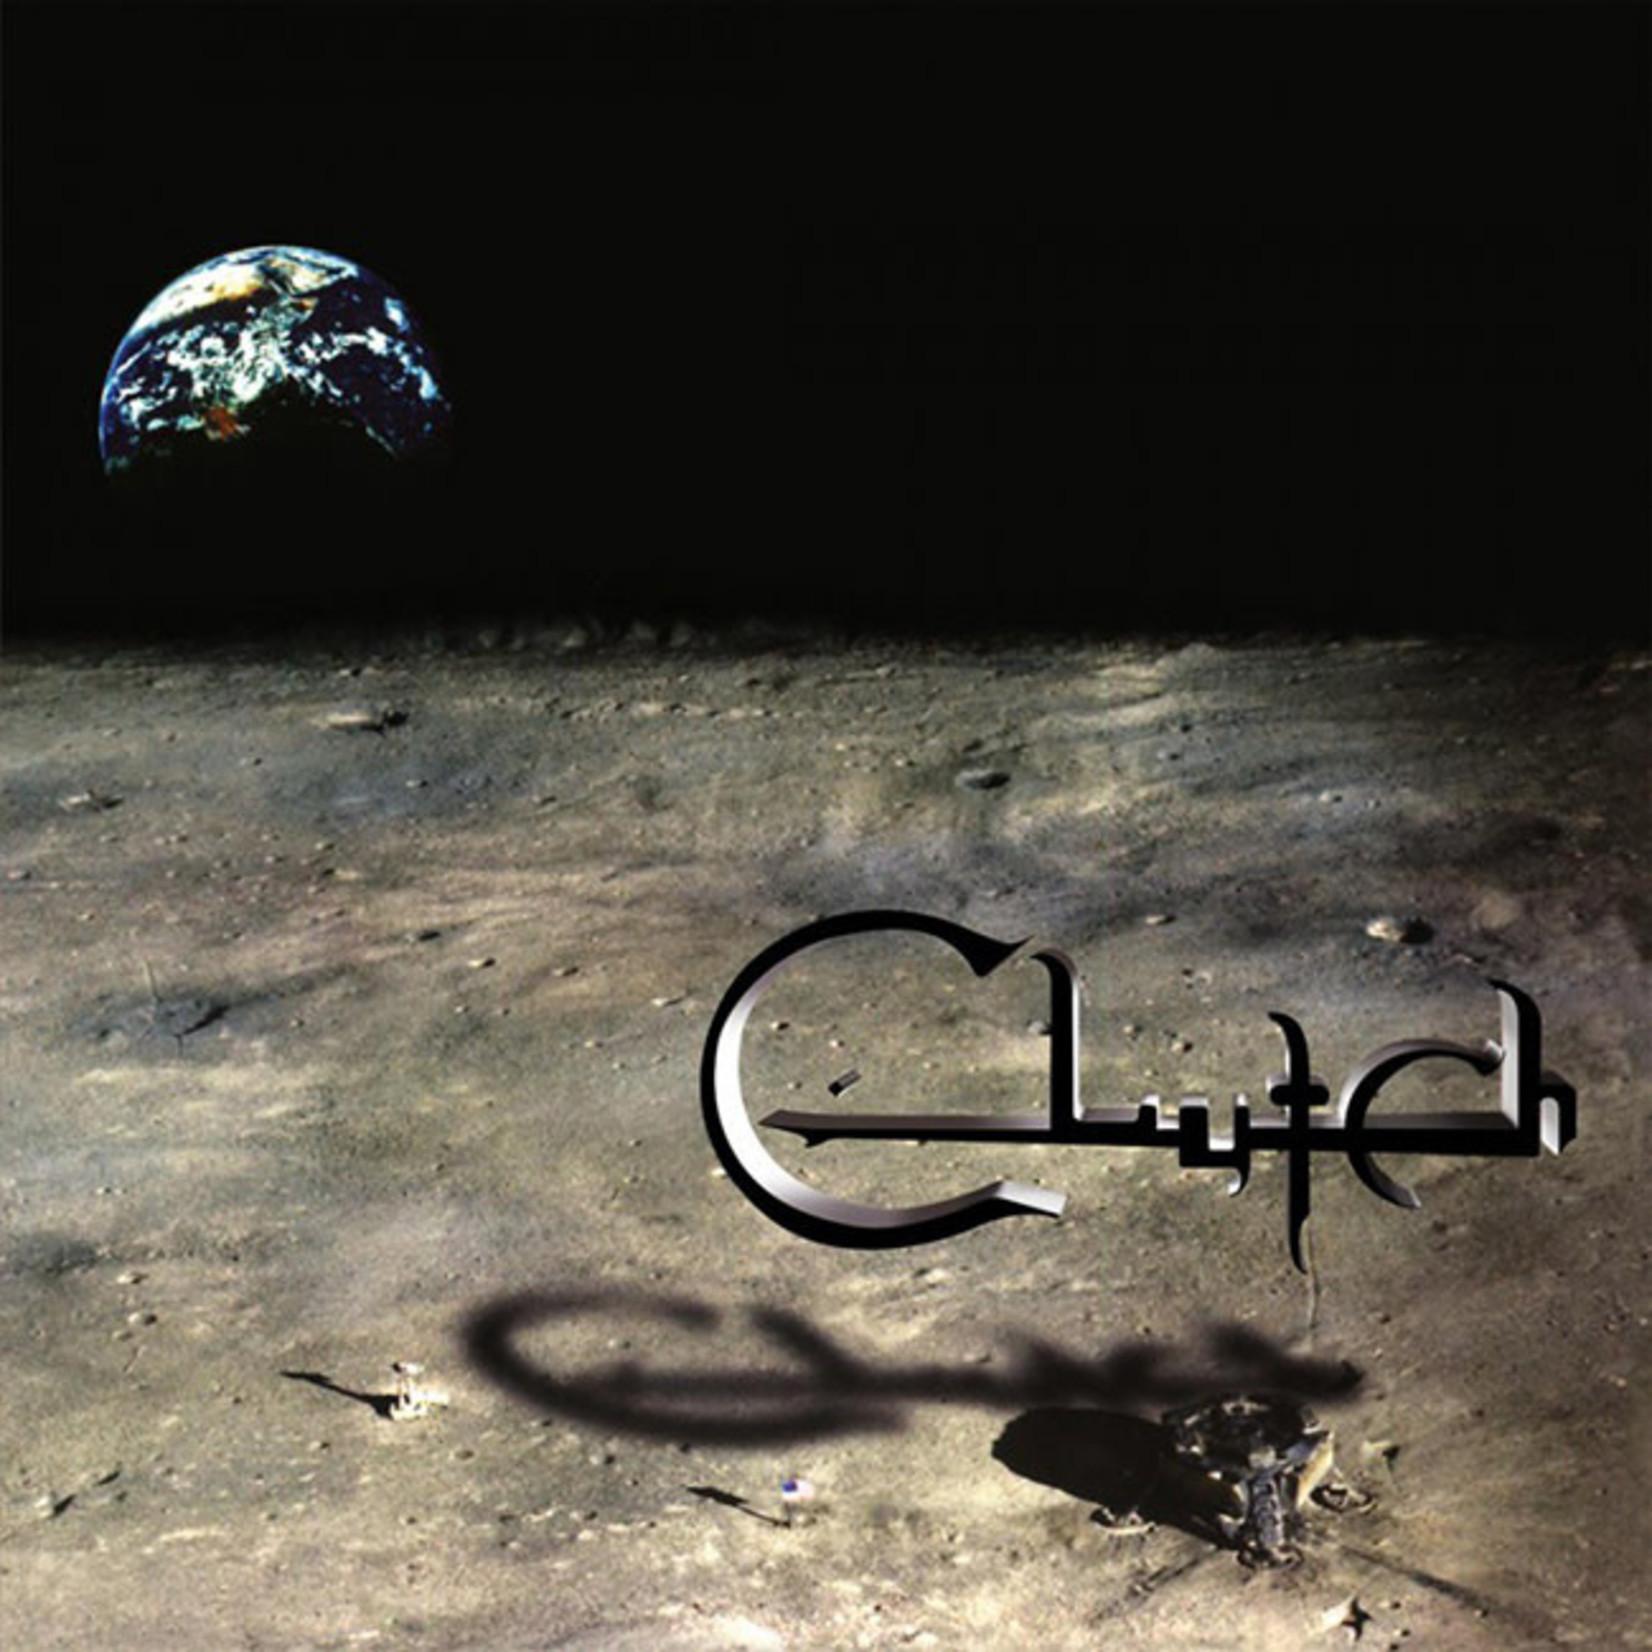 [New] Clutch: self-titled